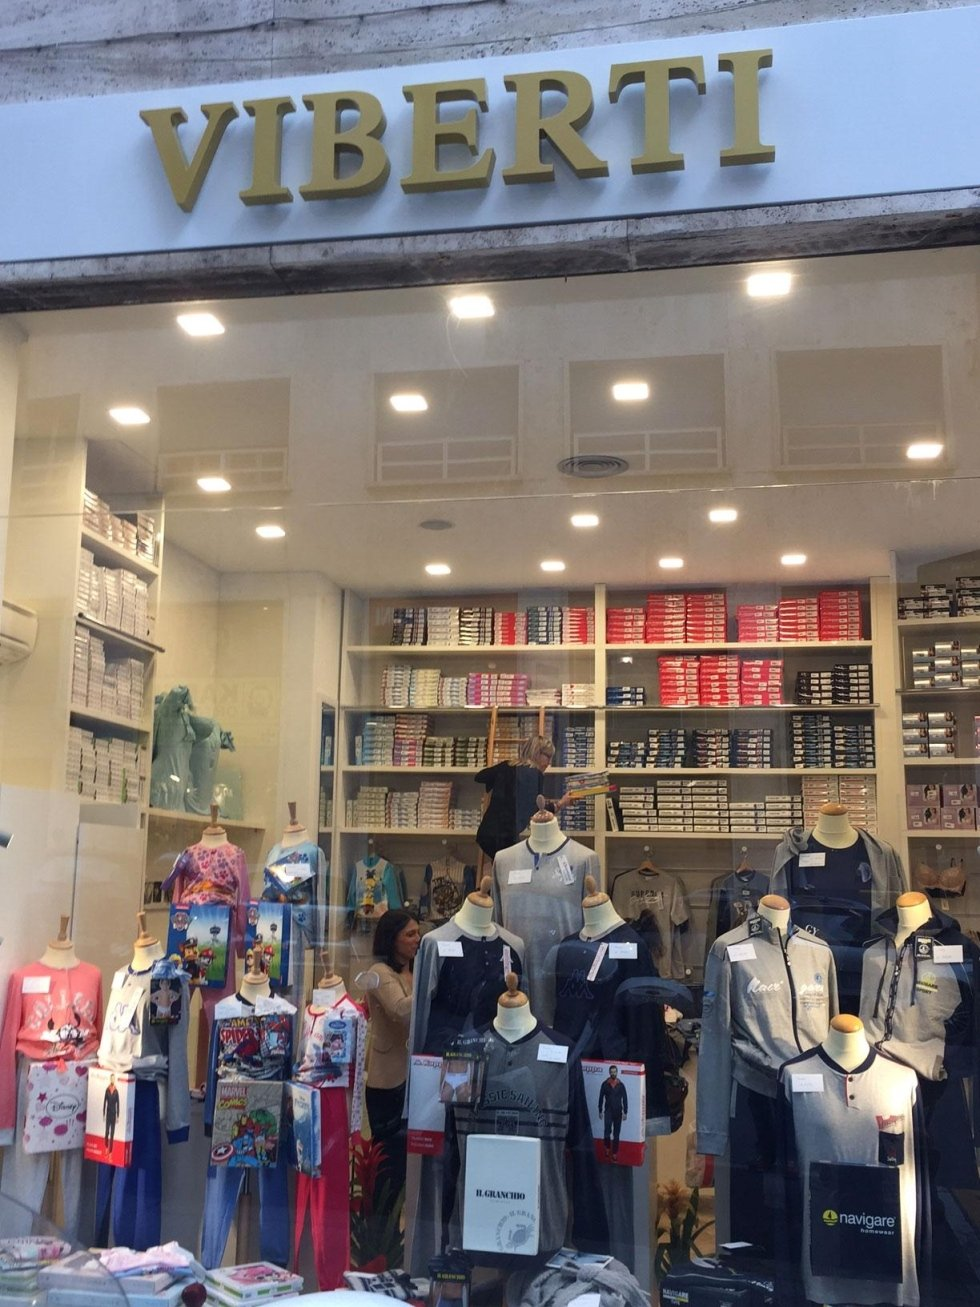 Viberti - Via Fieschi 33R Genova